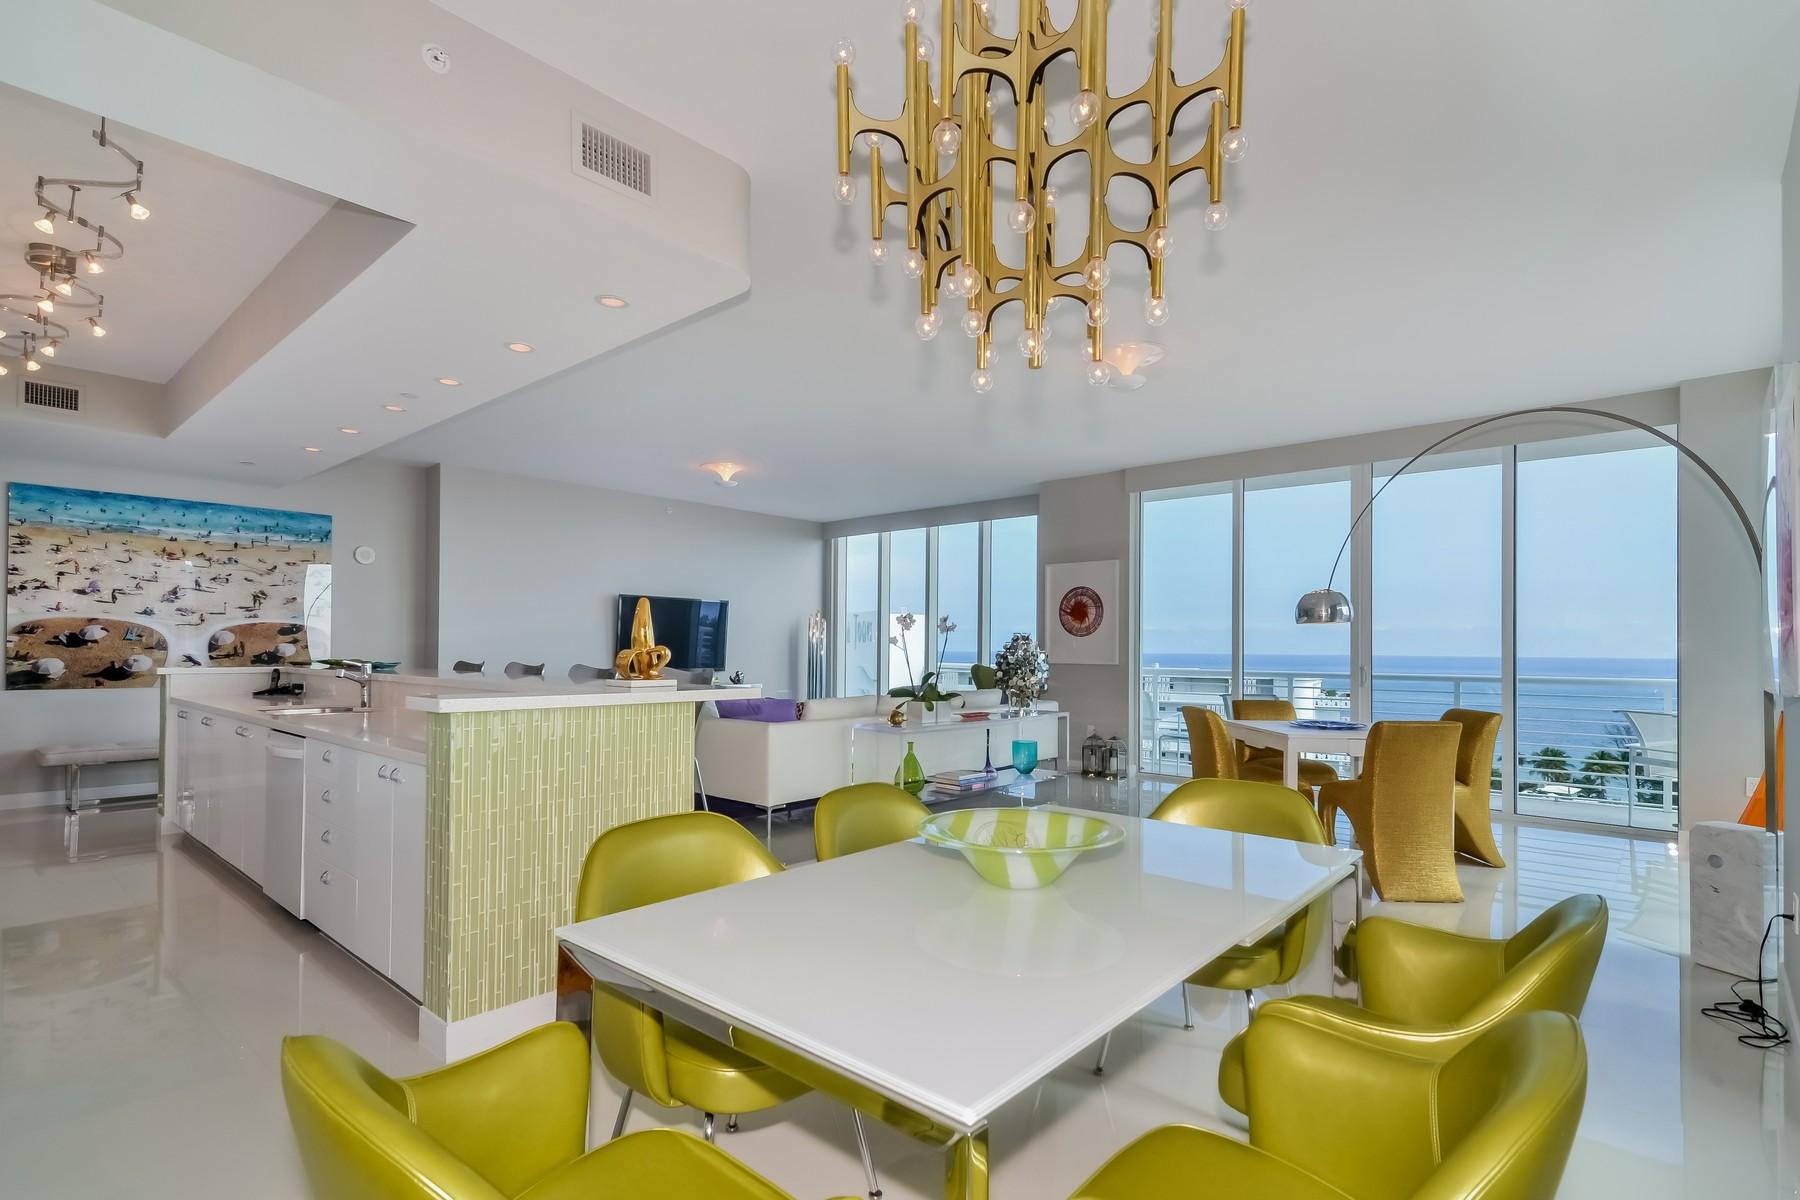 Condomínio para Venda às Sapphire 2821 N. Ocean Blvd. PH #5 Fort Lauderdale, Florida 33308 Estados Unidos